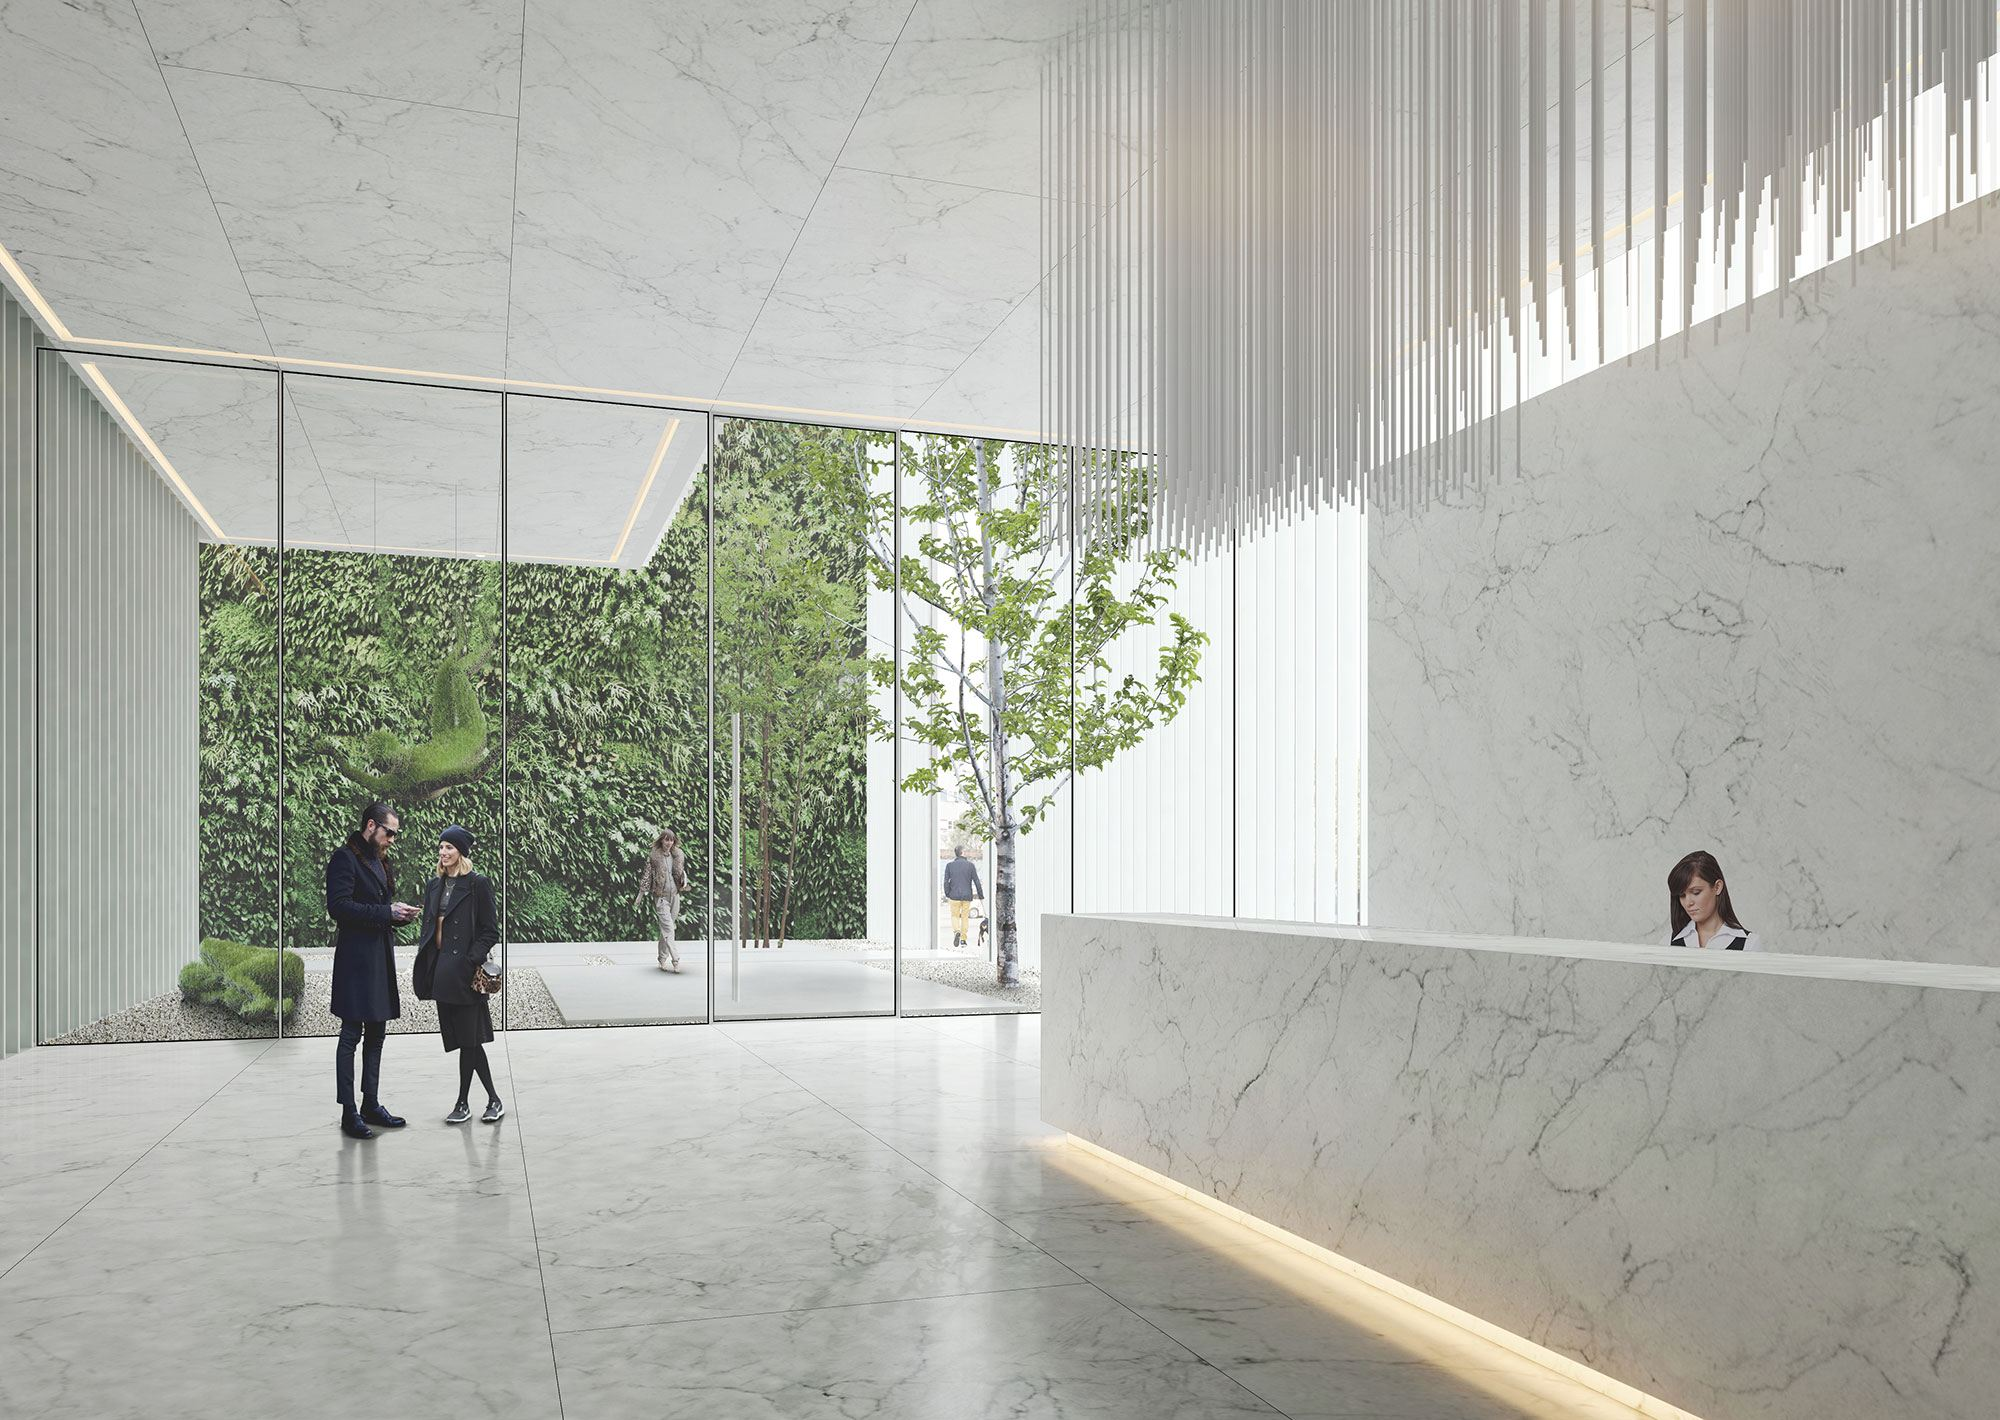 studio-seilern-architects-chelsea-tower-3